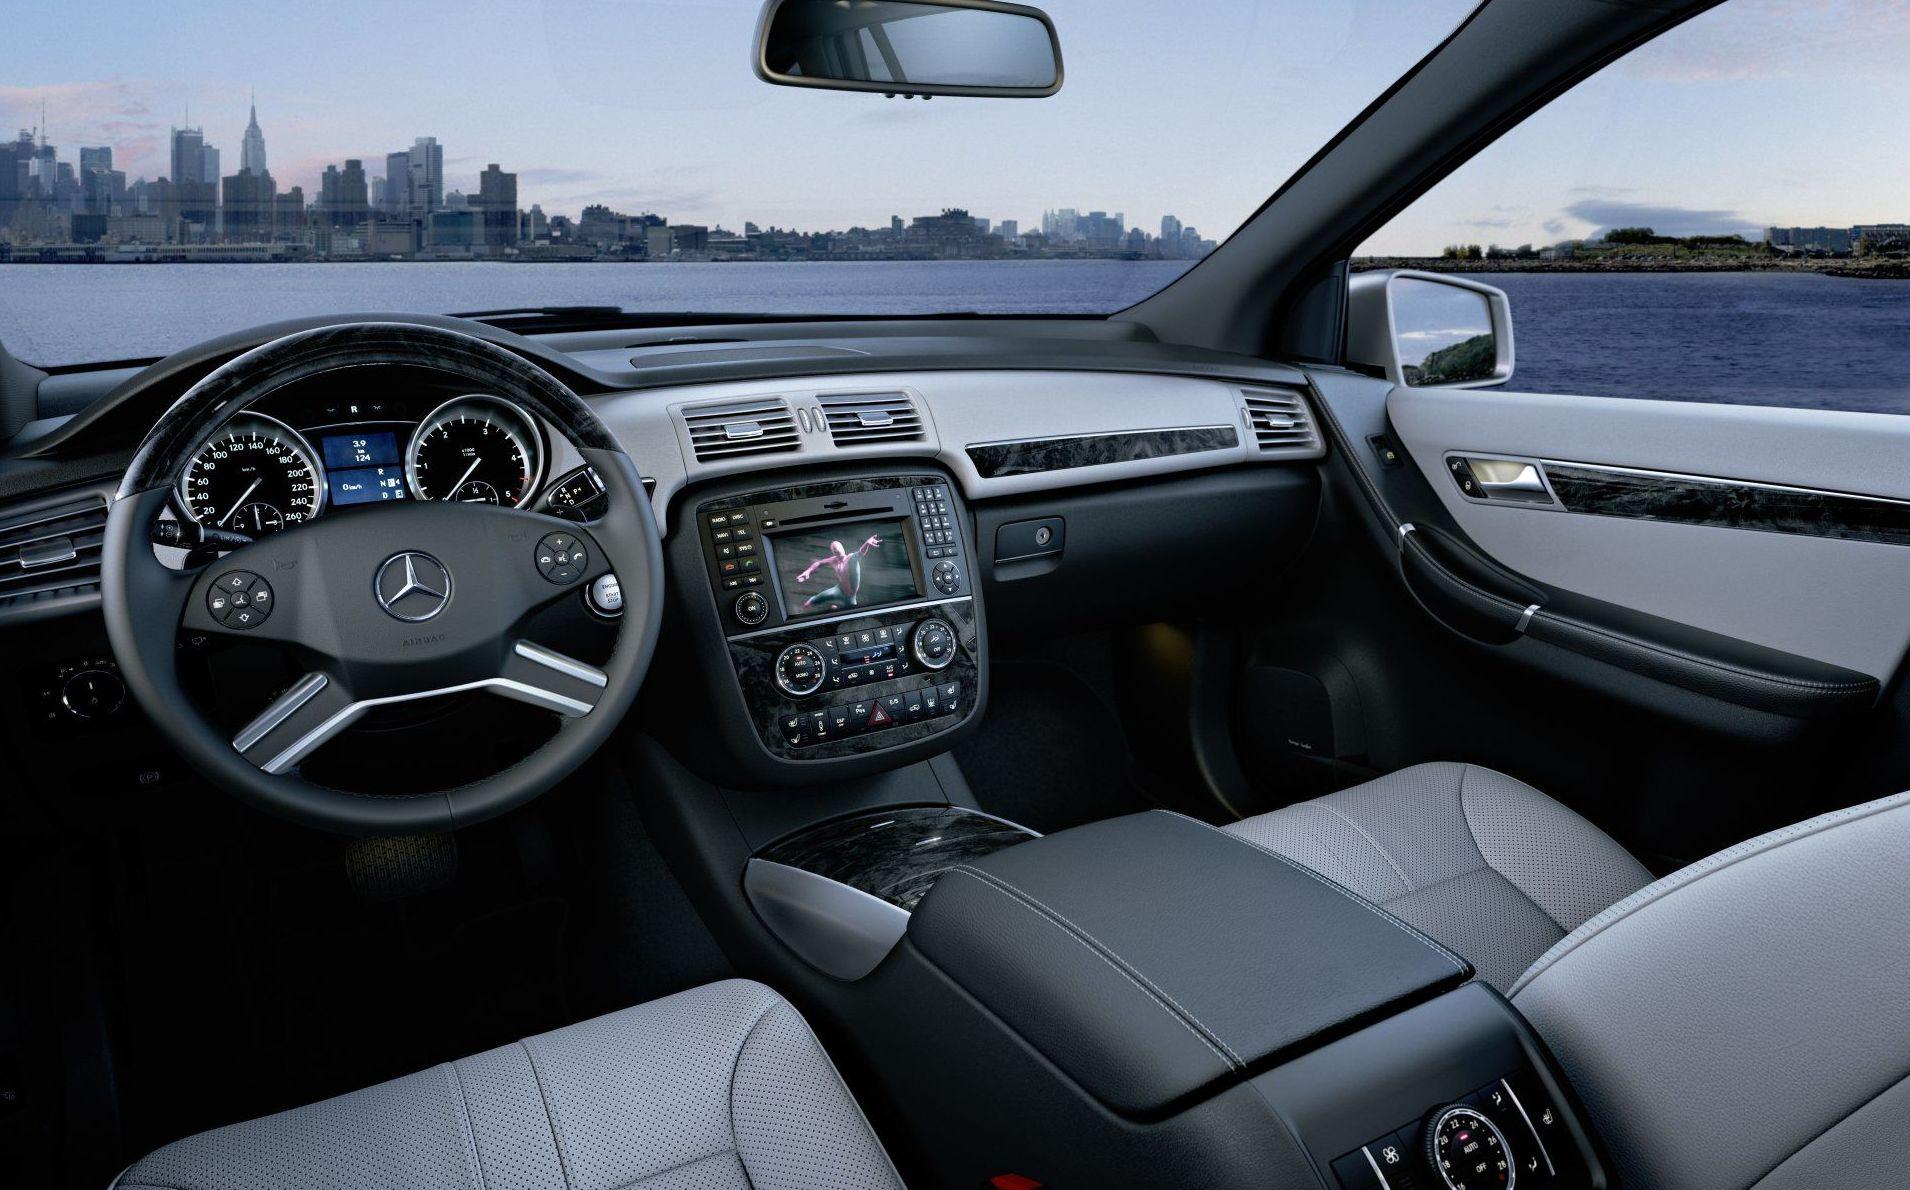 Reparación Pantallas radio navegadores gps sistemas Mercedes Comand APS NTG 2.5 NTG-2.5